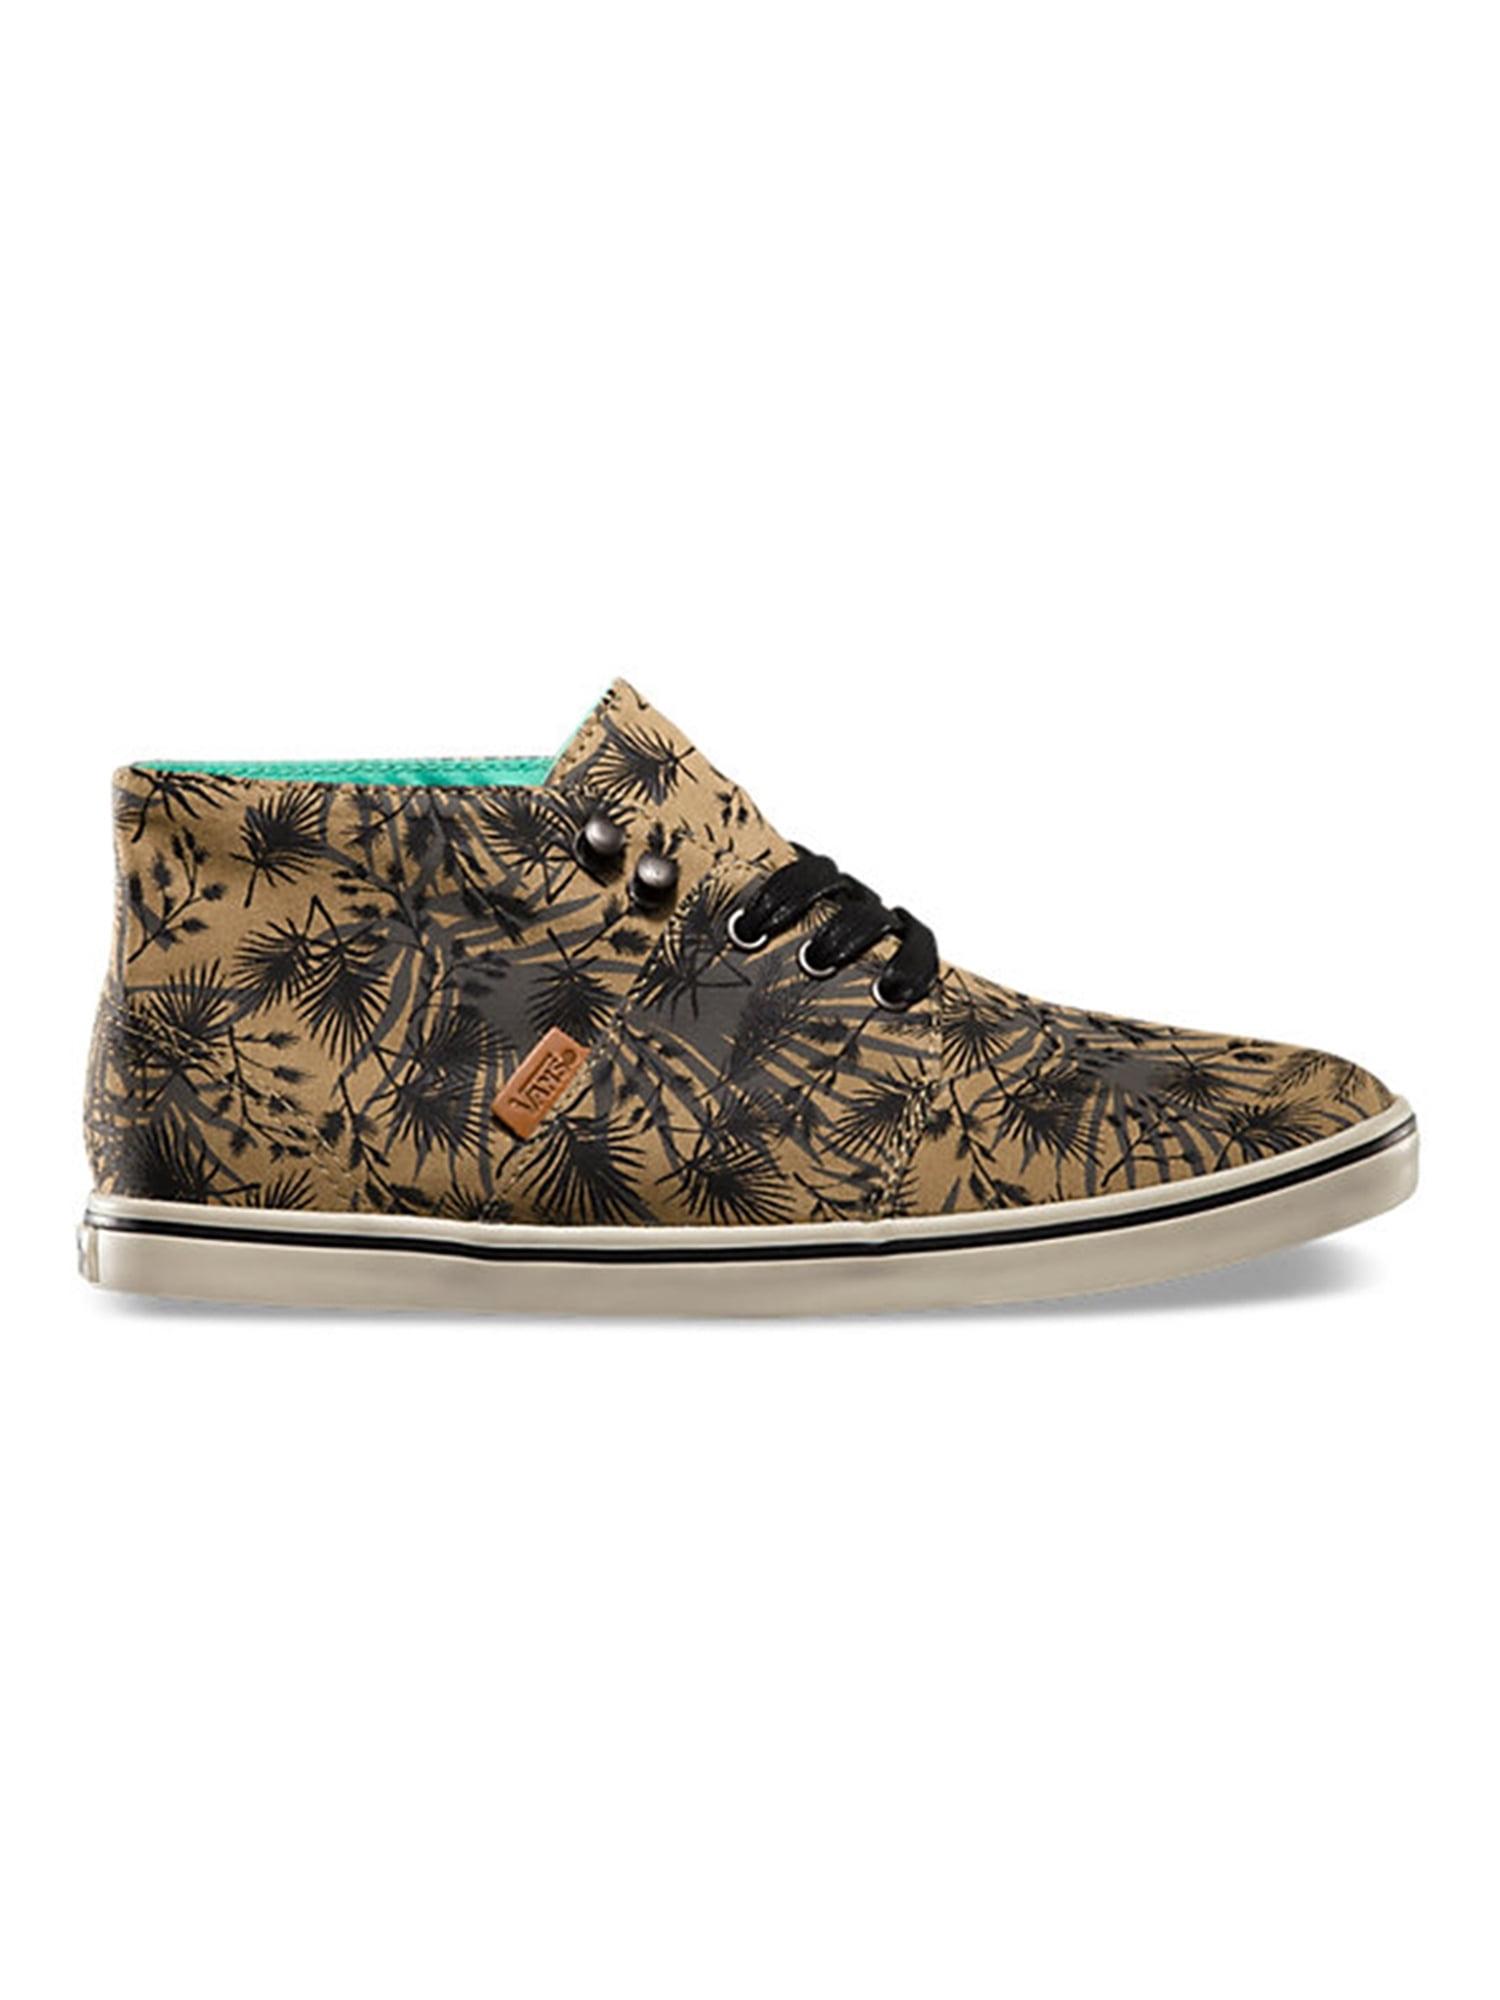 Vans Womens Camryn Slim Palm Camo Sneakers blacktan 5